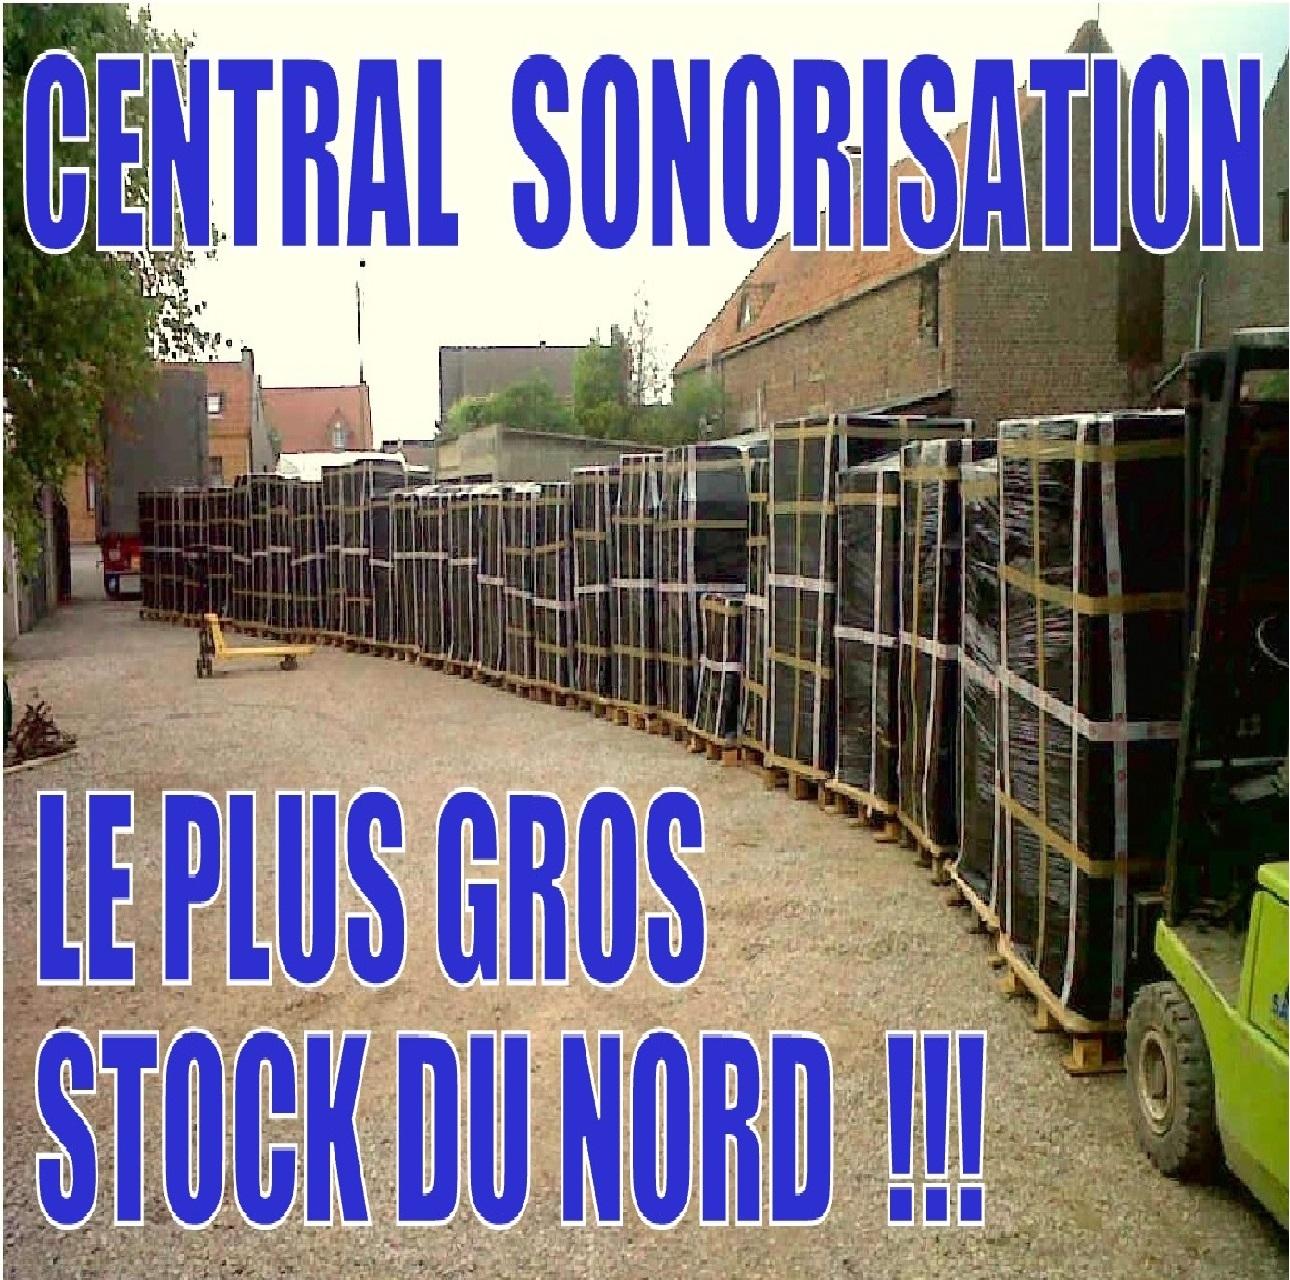 CENTRAL SONORISATION